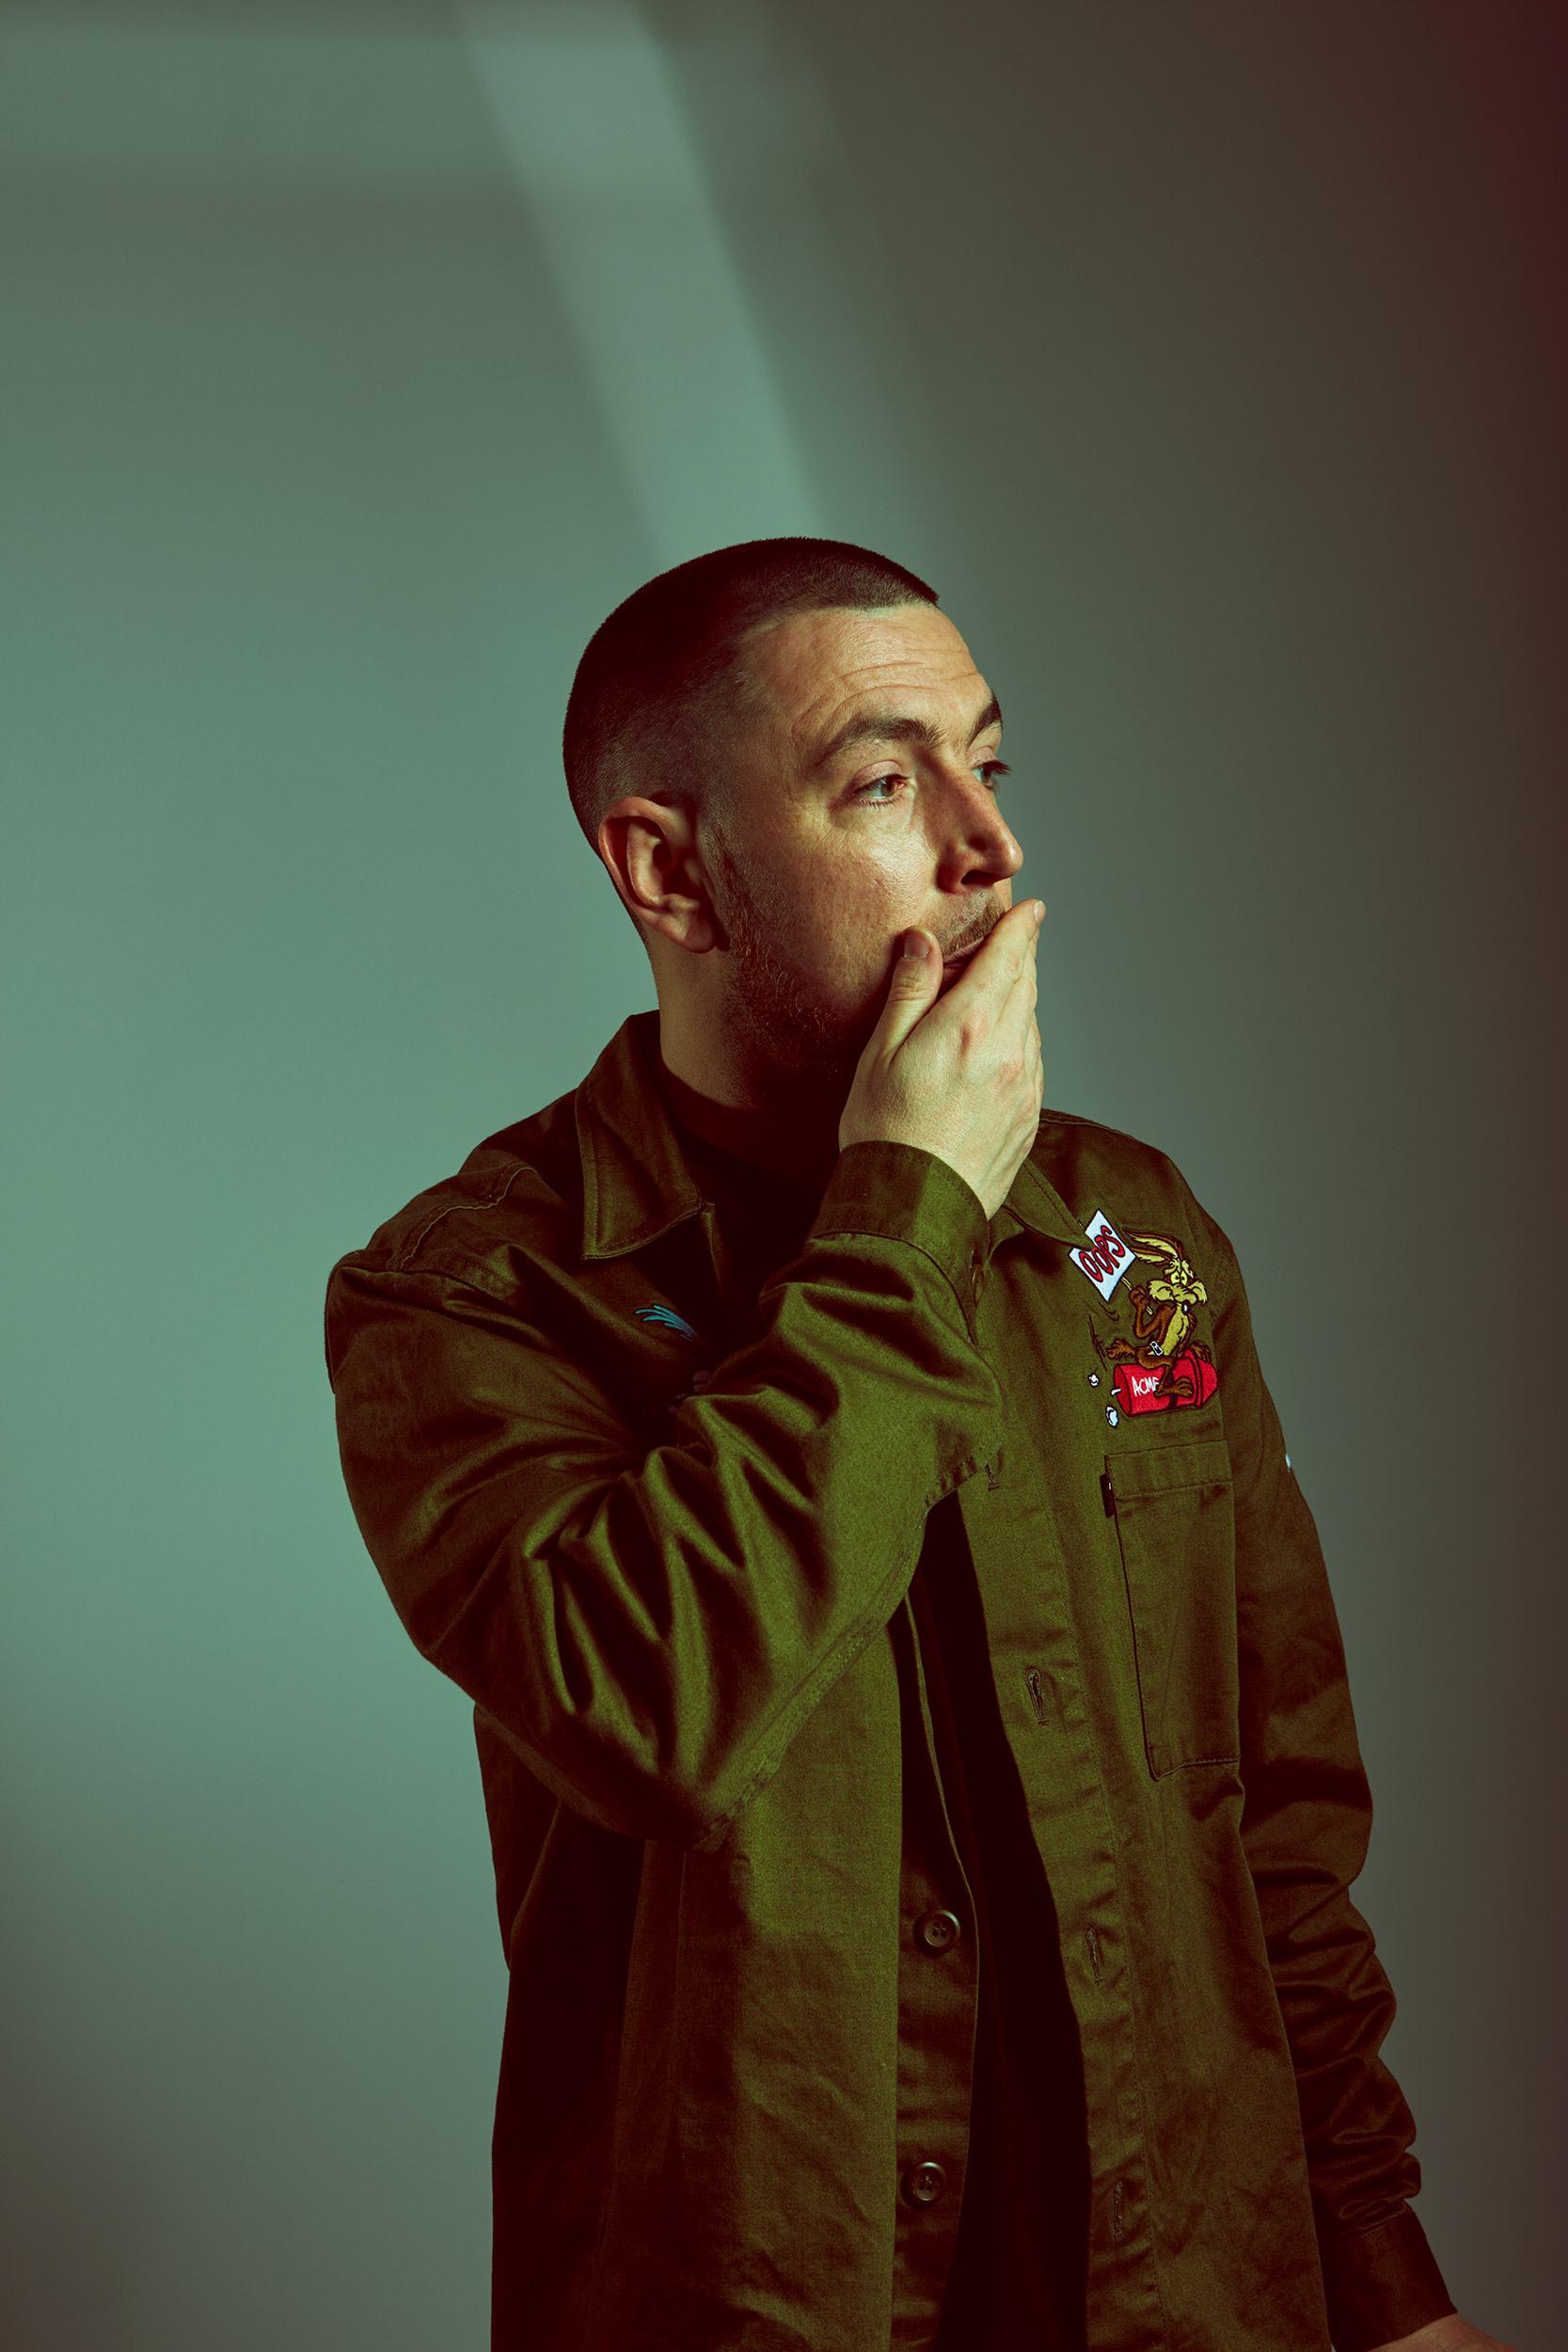 Jehst | Hip Hop Artist & Producer